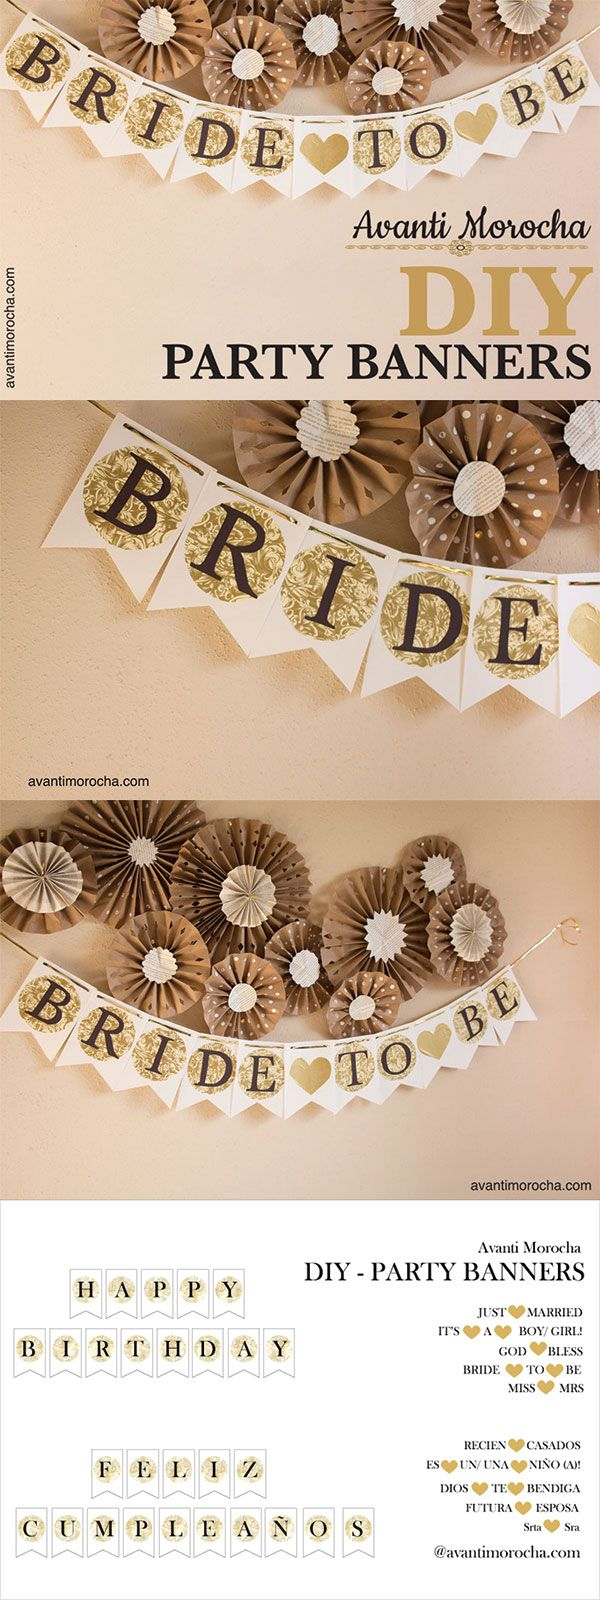 DIY Party Banners / decorations / events / bridal shower, birthday, baptism, weddings, baby showers. Bodas, bautizos, despedida de soltera